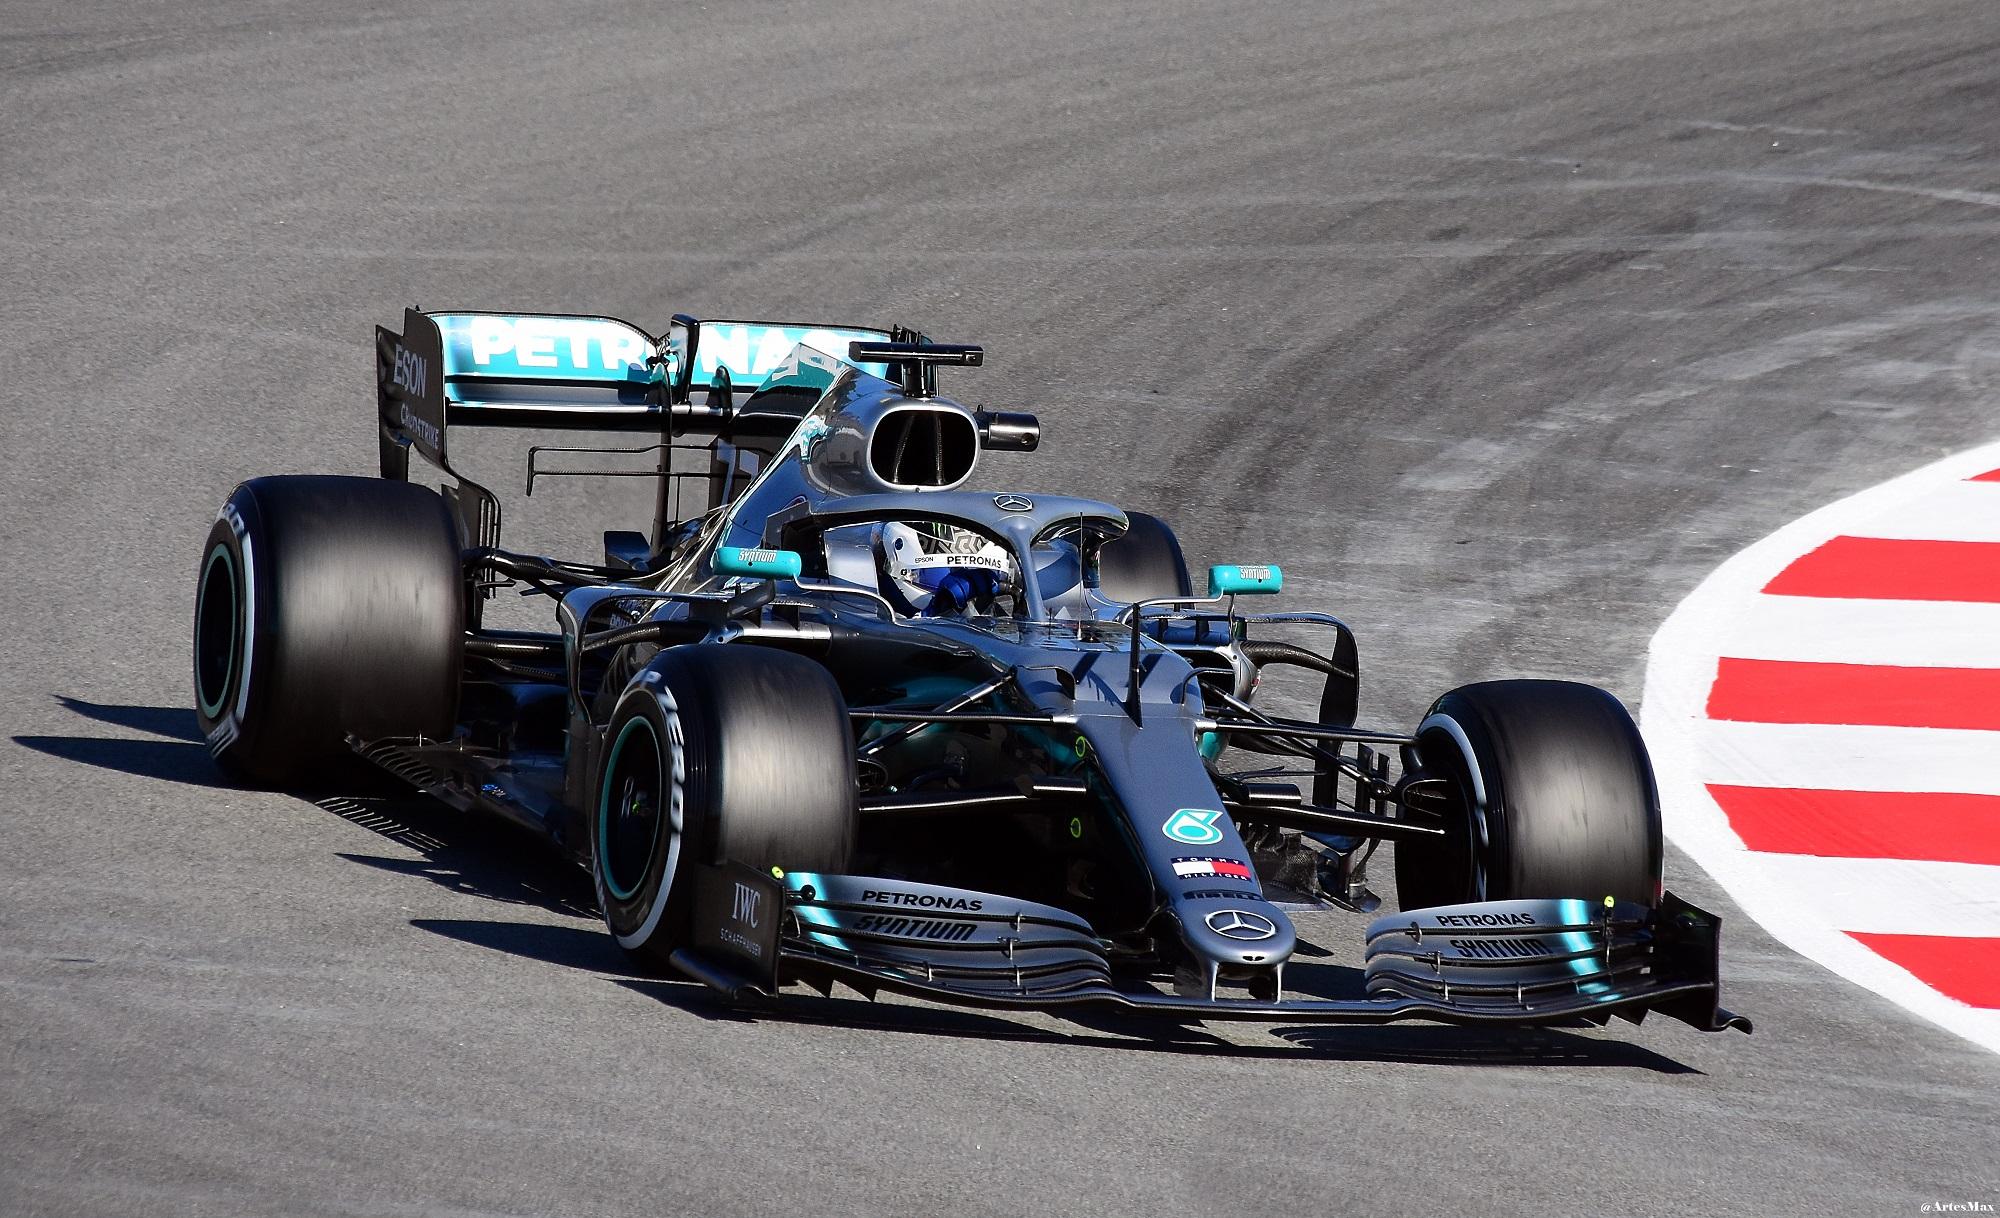 Mercedes AMG F1 W10 EQ Power+ - Wikipedia